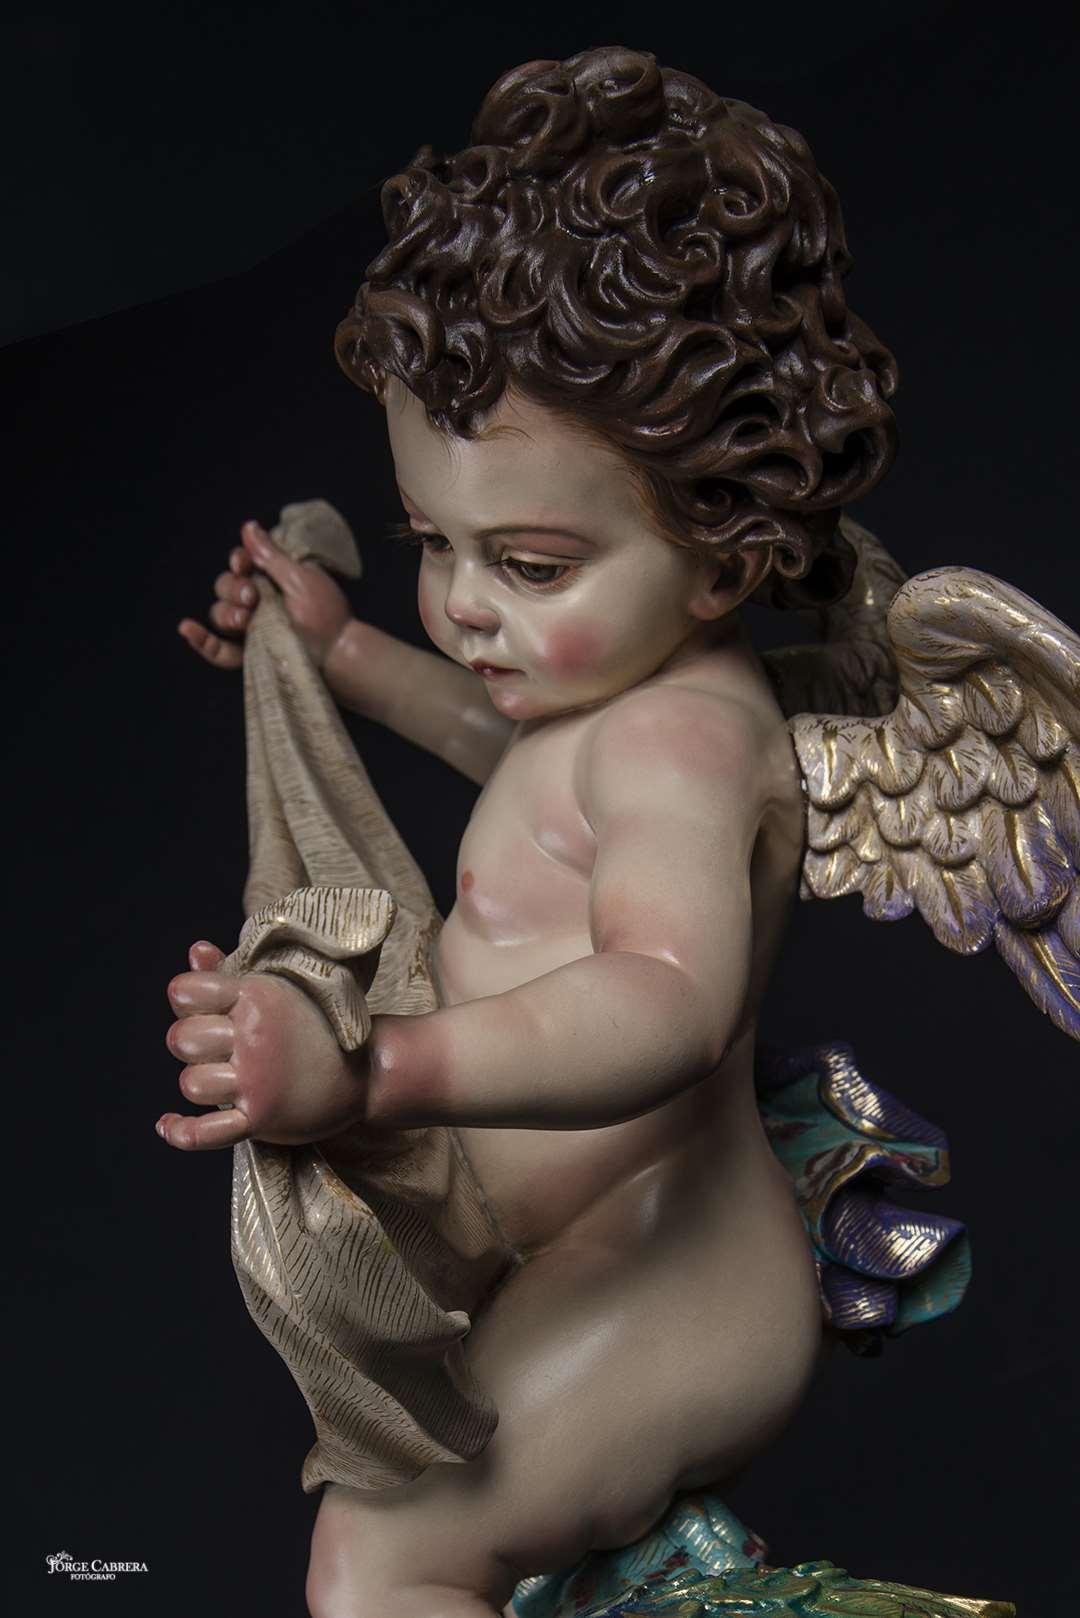 TERCER ÁNGEL HERMANDAD RESURRECIÓN